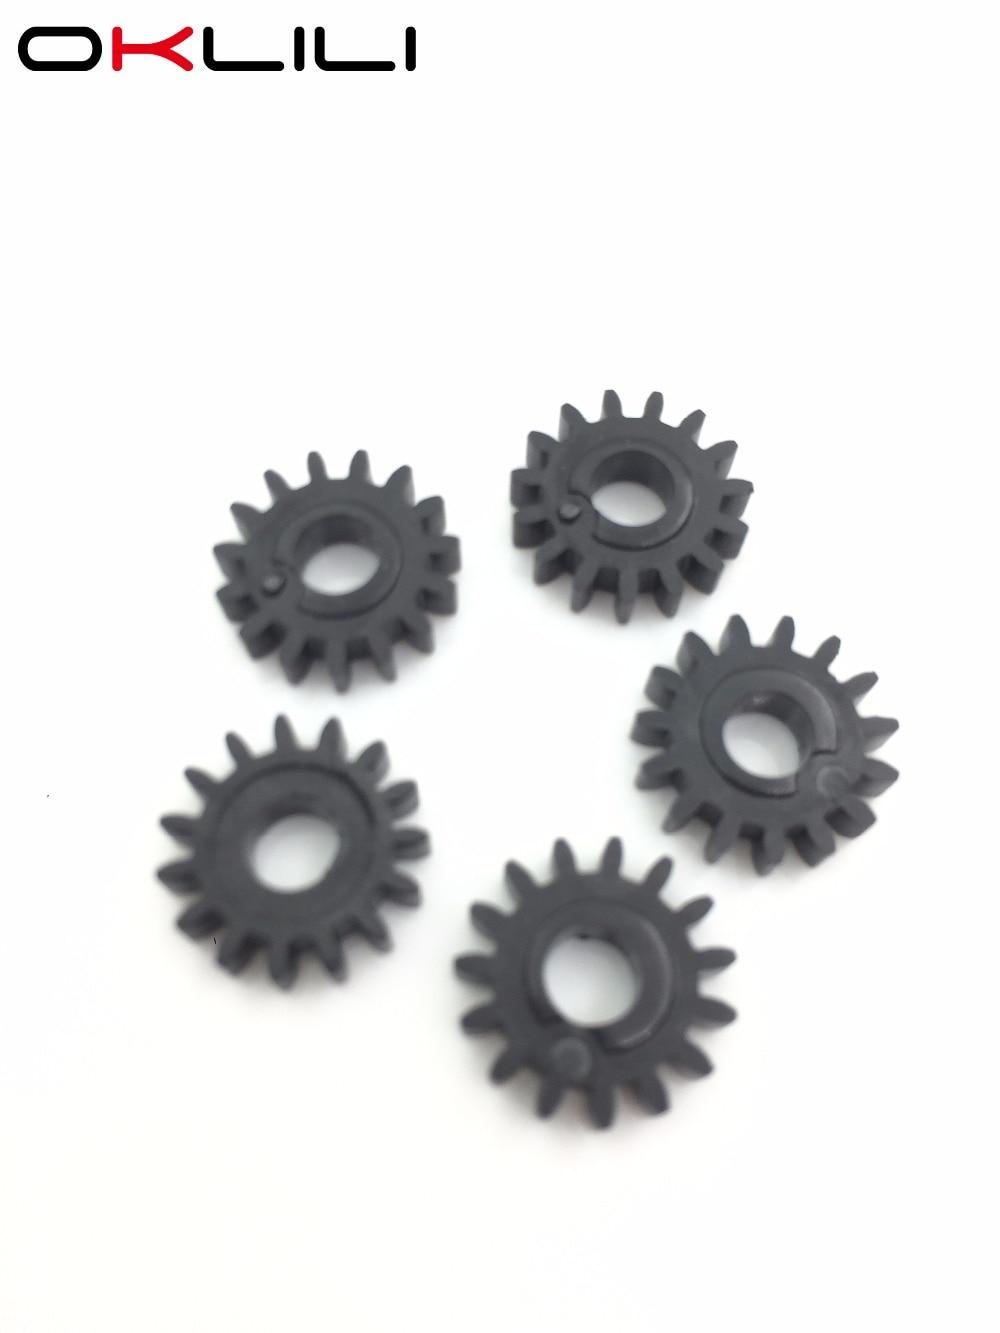 цена на 5PC Clutch Gear 15T Carriage lock for HP C3150 C3180 C4140 C4150 C4280 D5060 D5065 D5069 J3680 6310 L7680 J4500 J4550 J4580 2355